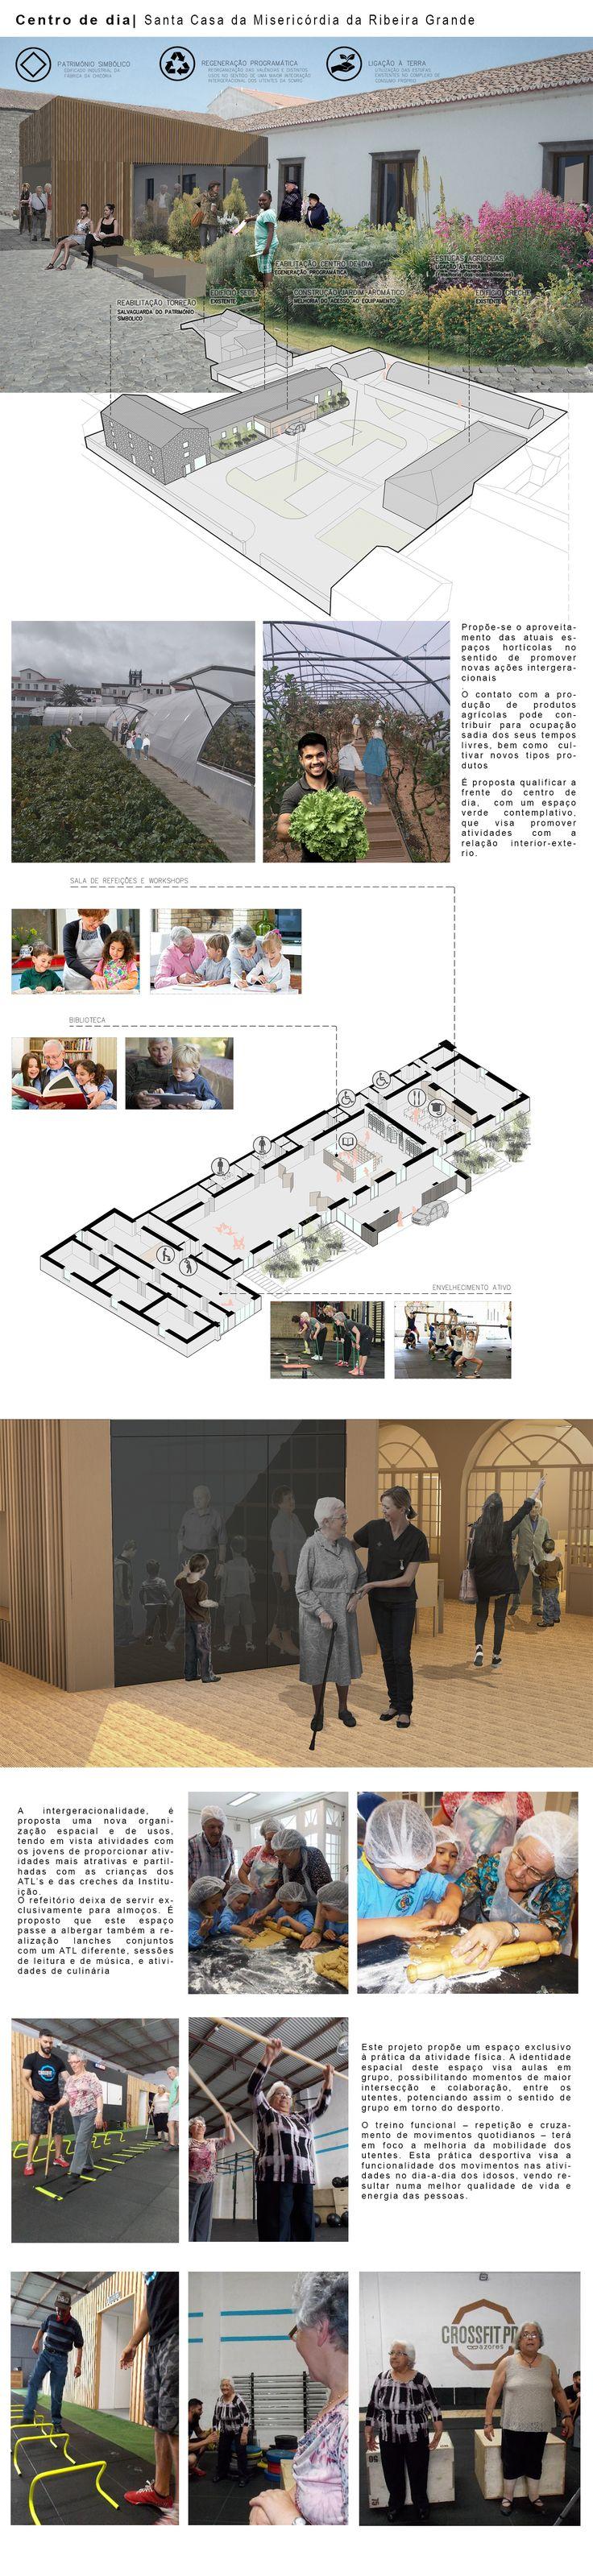 Centro de dia da Santa Casa da Misericórdia da Ribeira  Grande #architecture  #crossfit #CrossFitsenior #constructionlife #arquitectura #azores #açores #saomiguel #rabodepeixe #ribeiragrande #architecturelovers